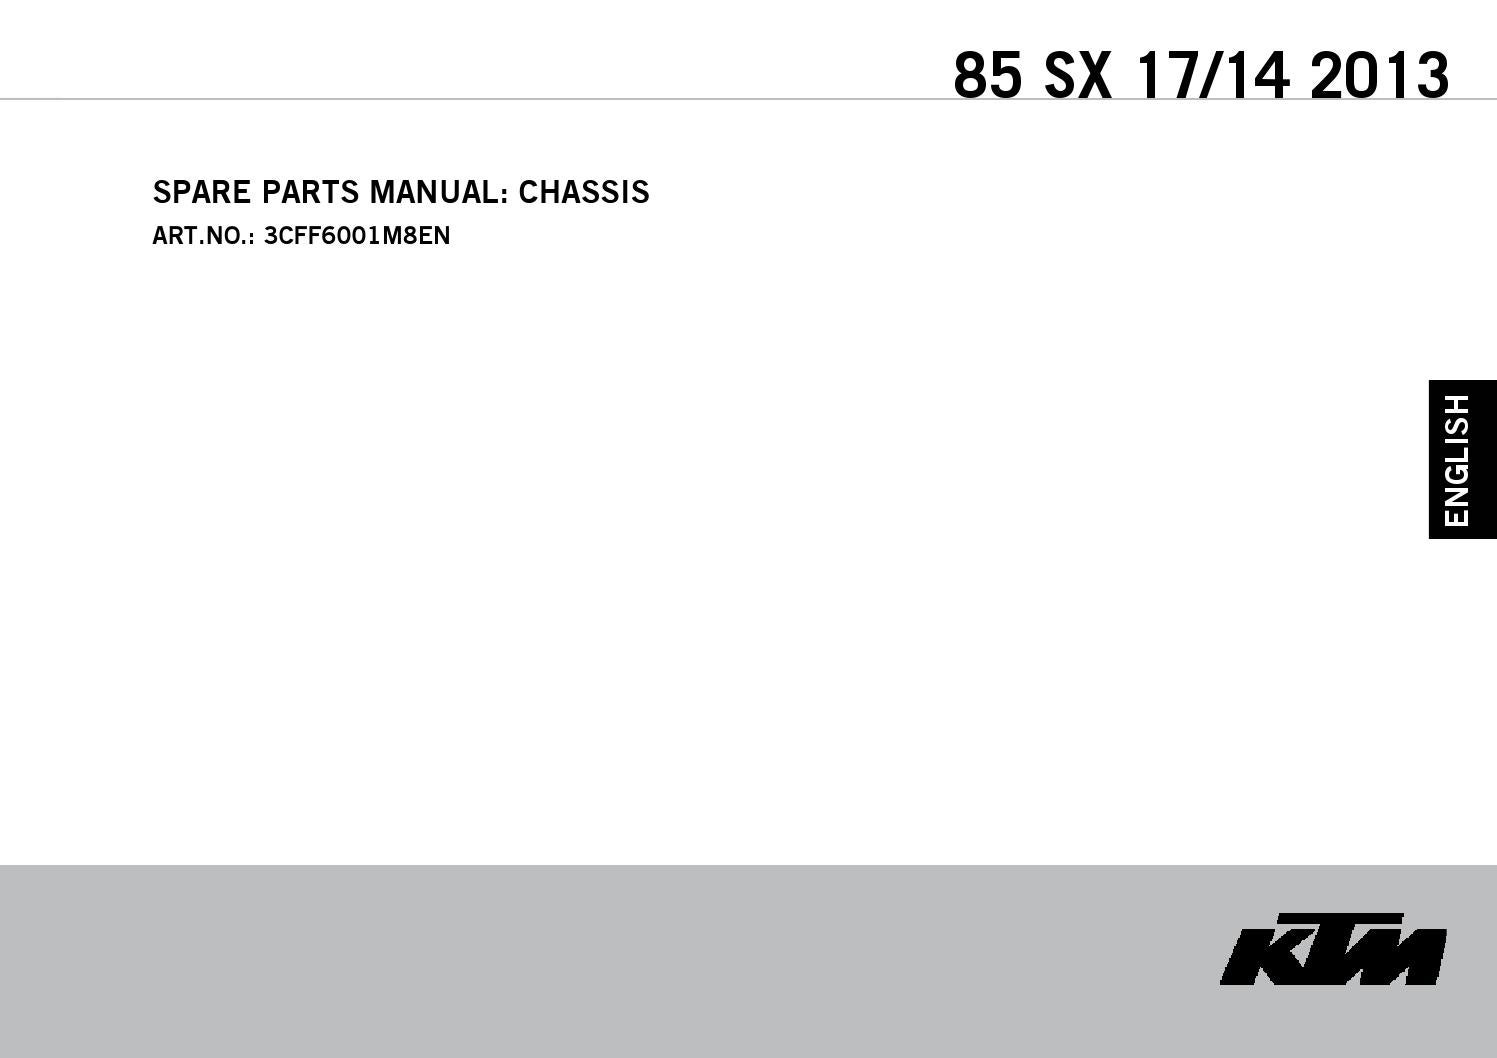 KTM FRONT MASTER HAND BRAKE CYLINDER REPAIR PISTON KIT 85 SX 2013 70002032000